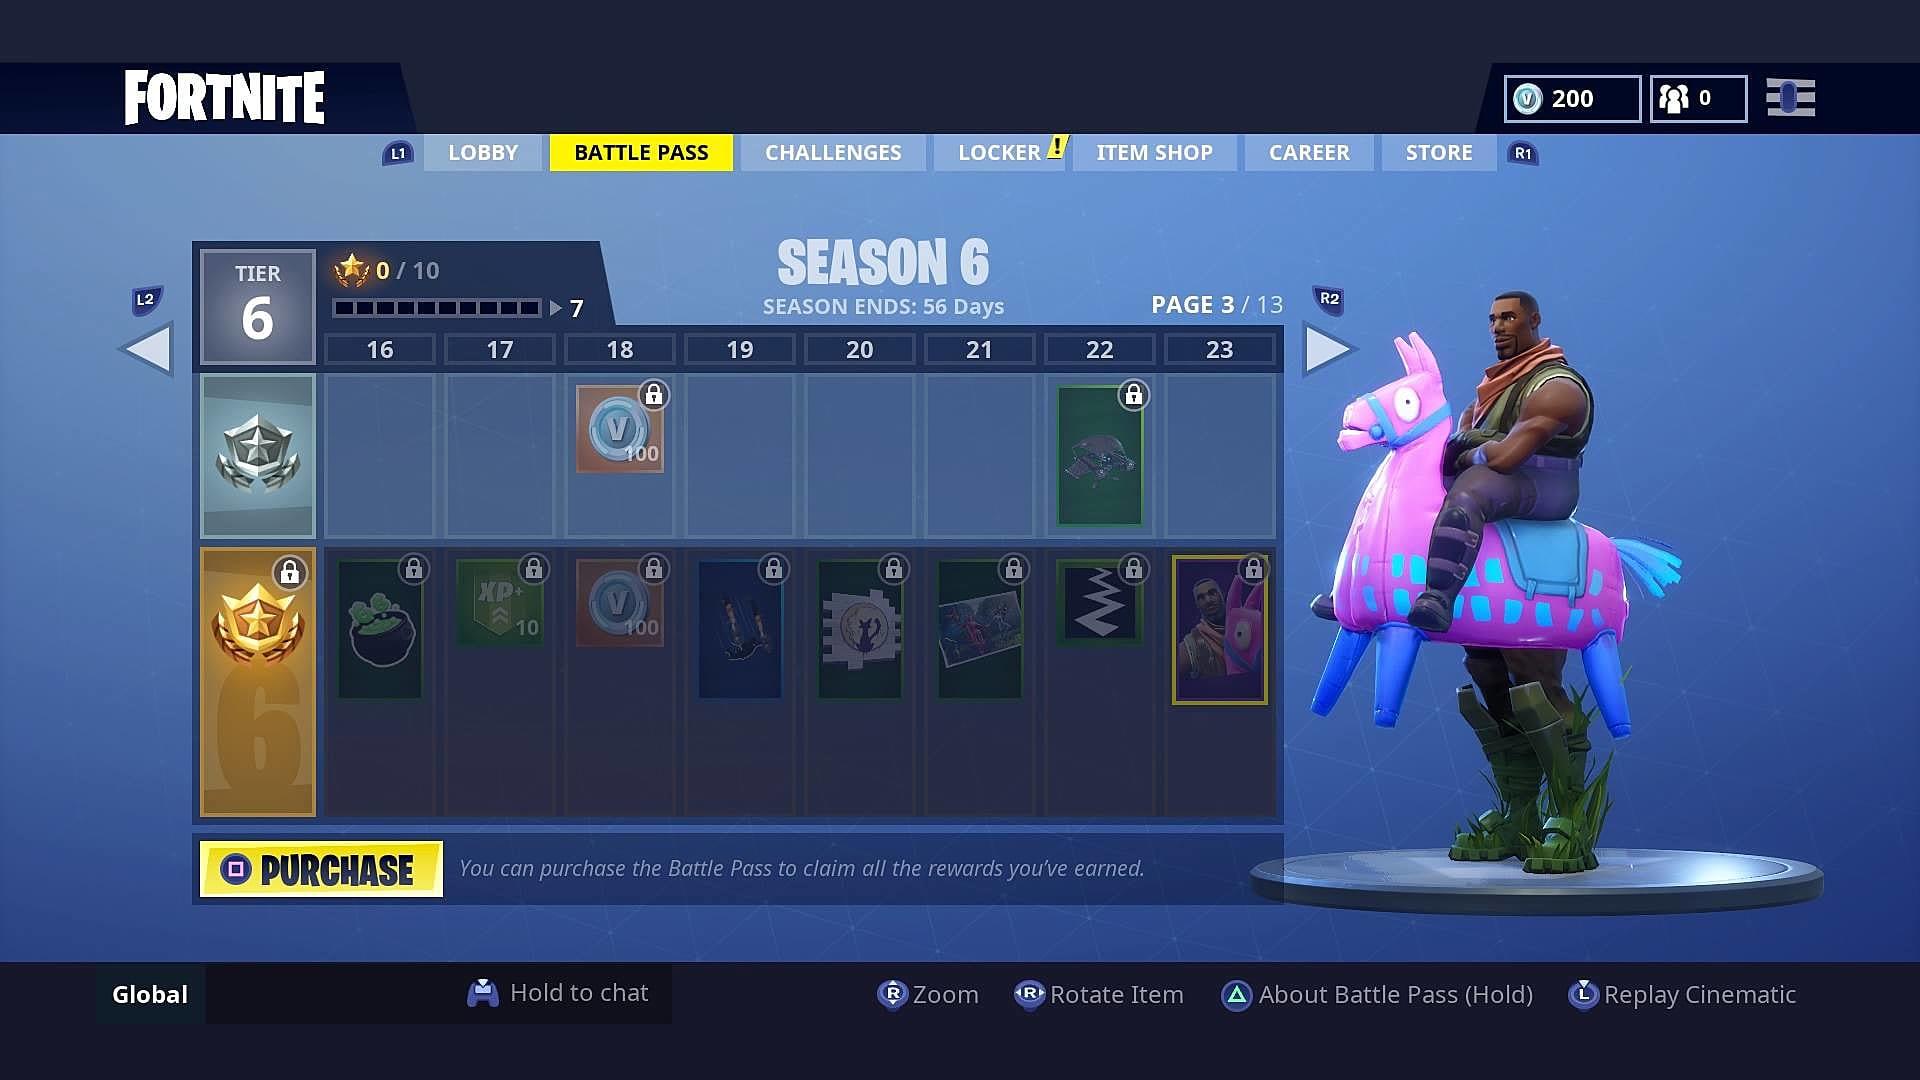 The Complete Fortnite Season 6 Skins List